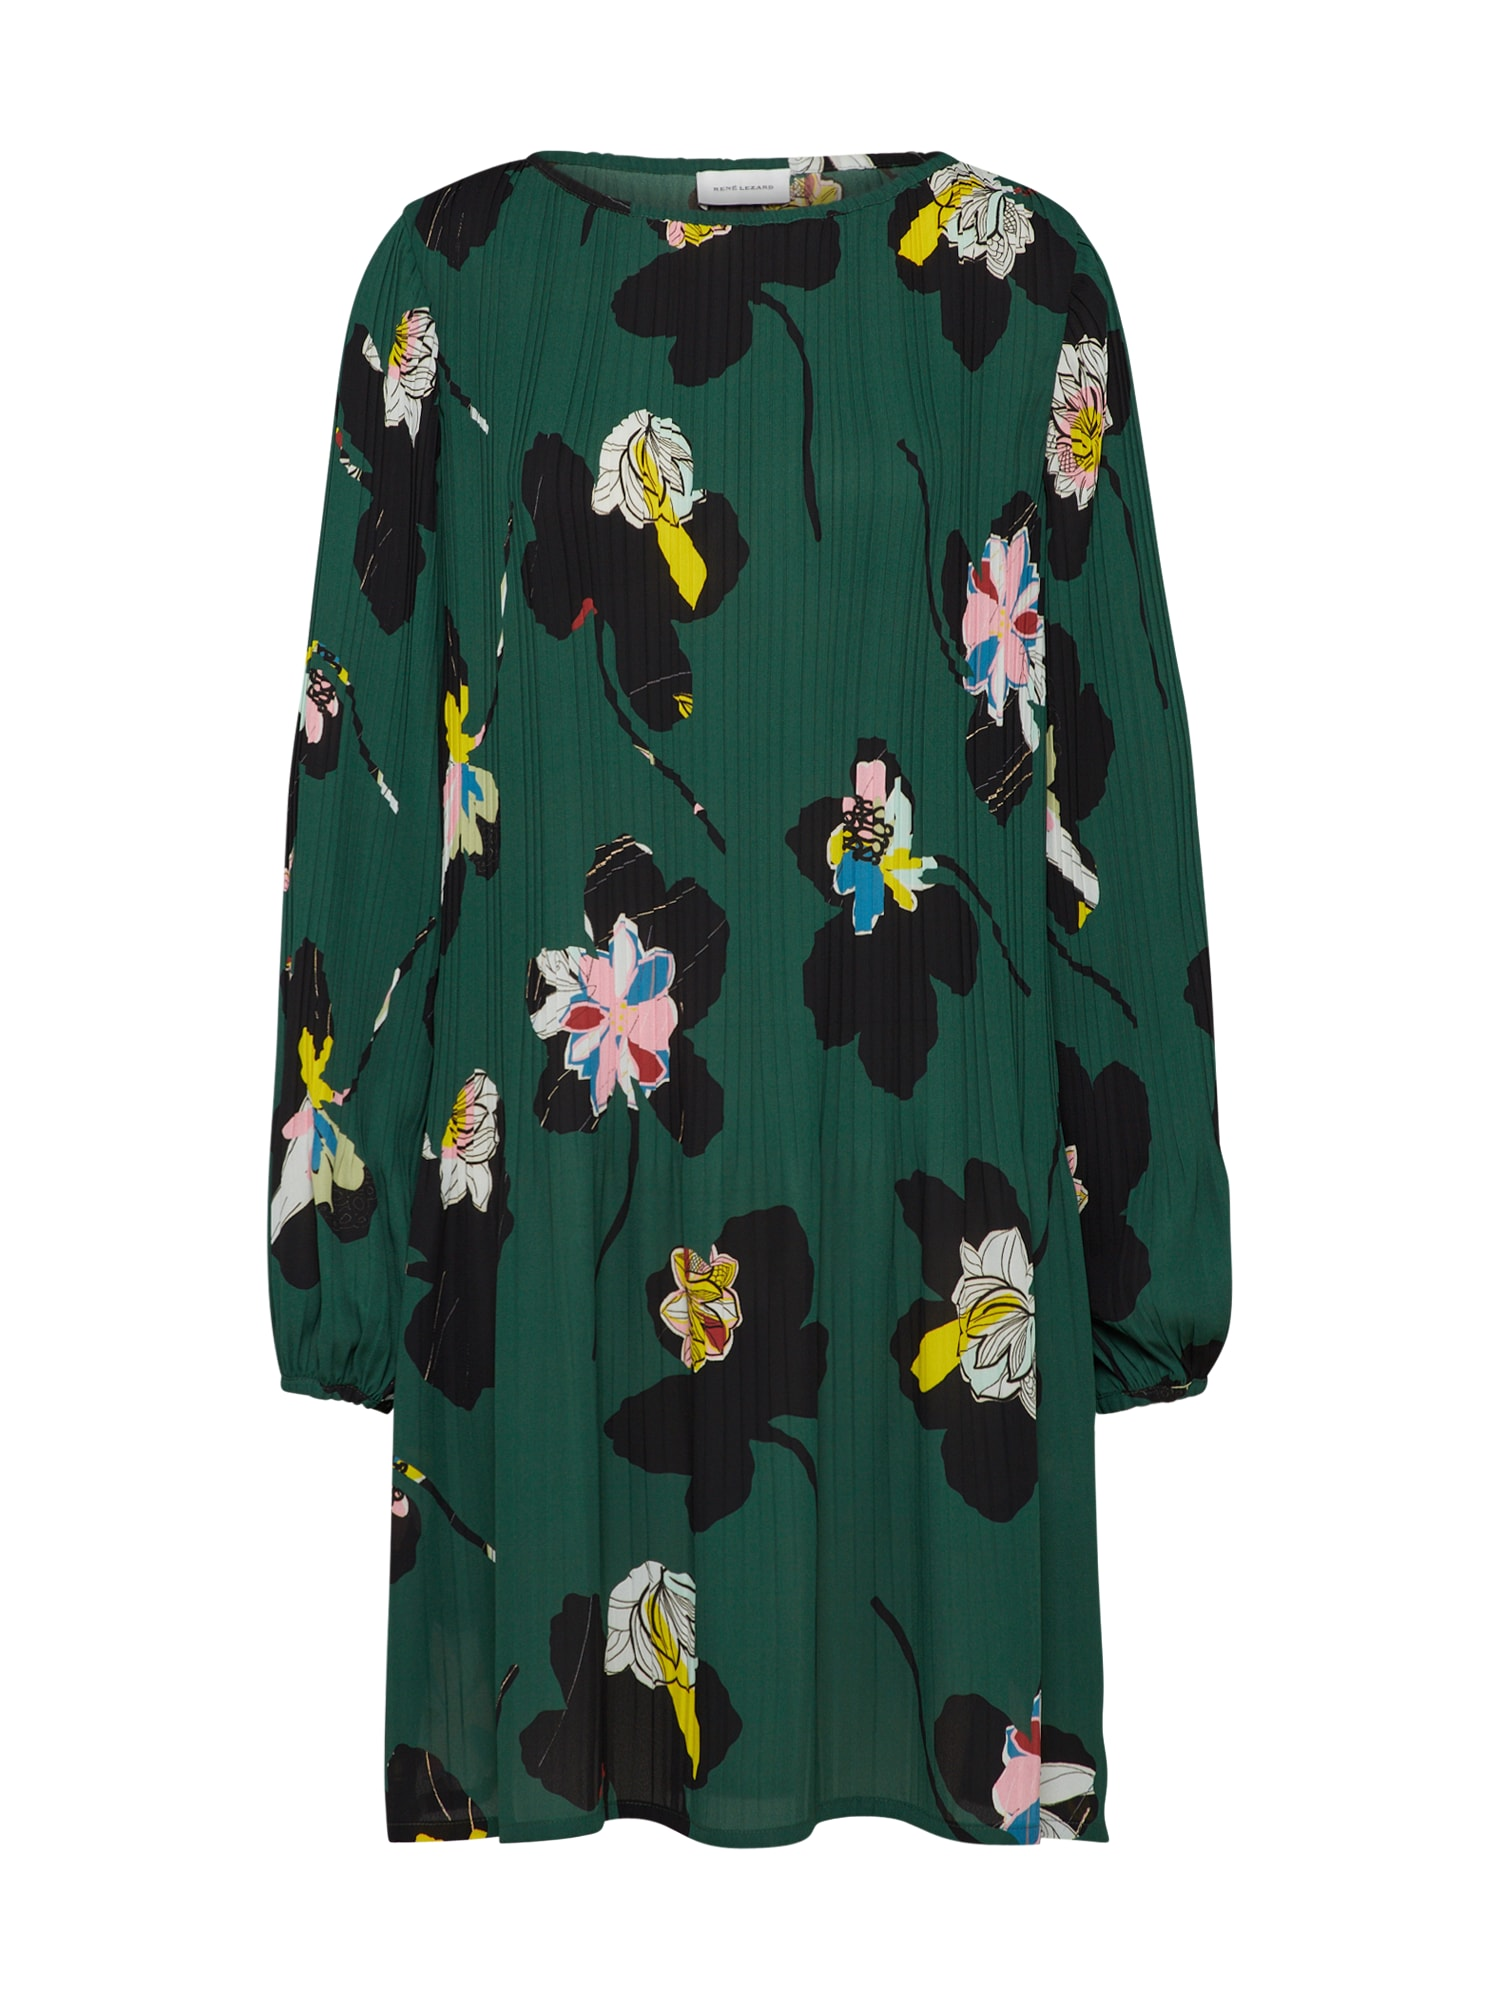 Šaty tmavě zelená mix barev RENÉ LEZARD